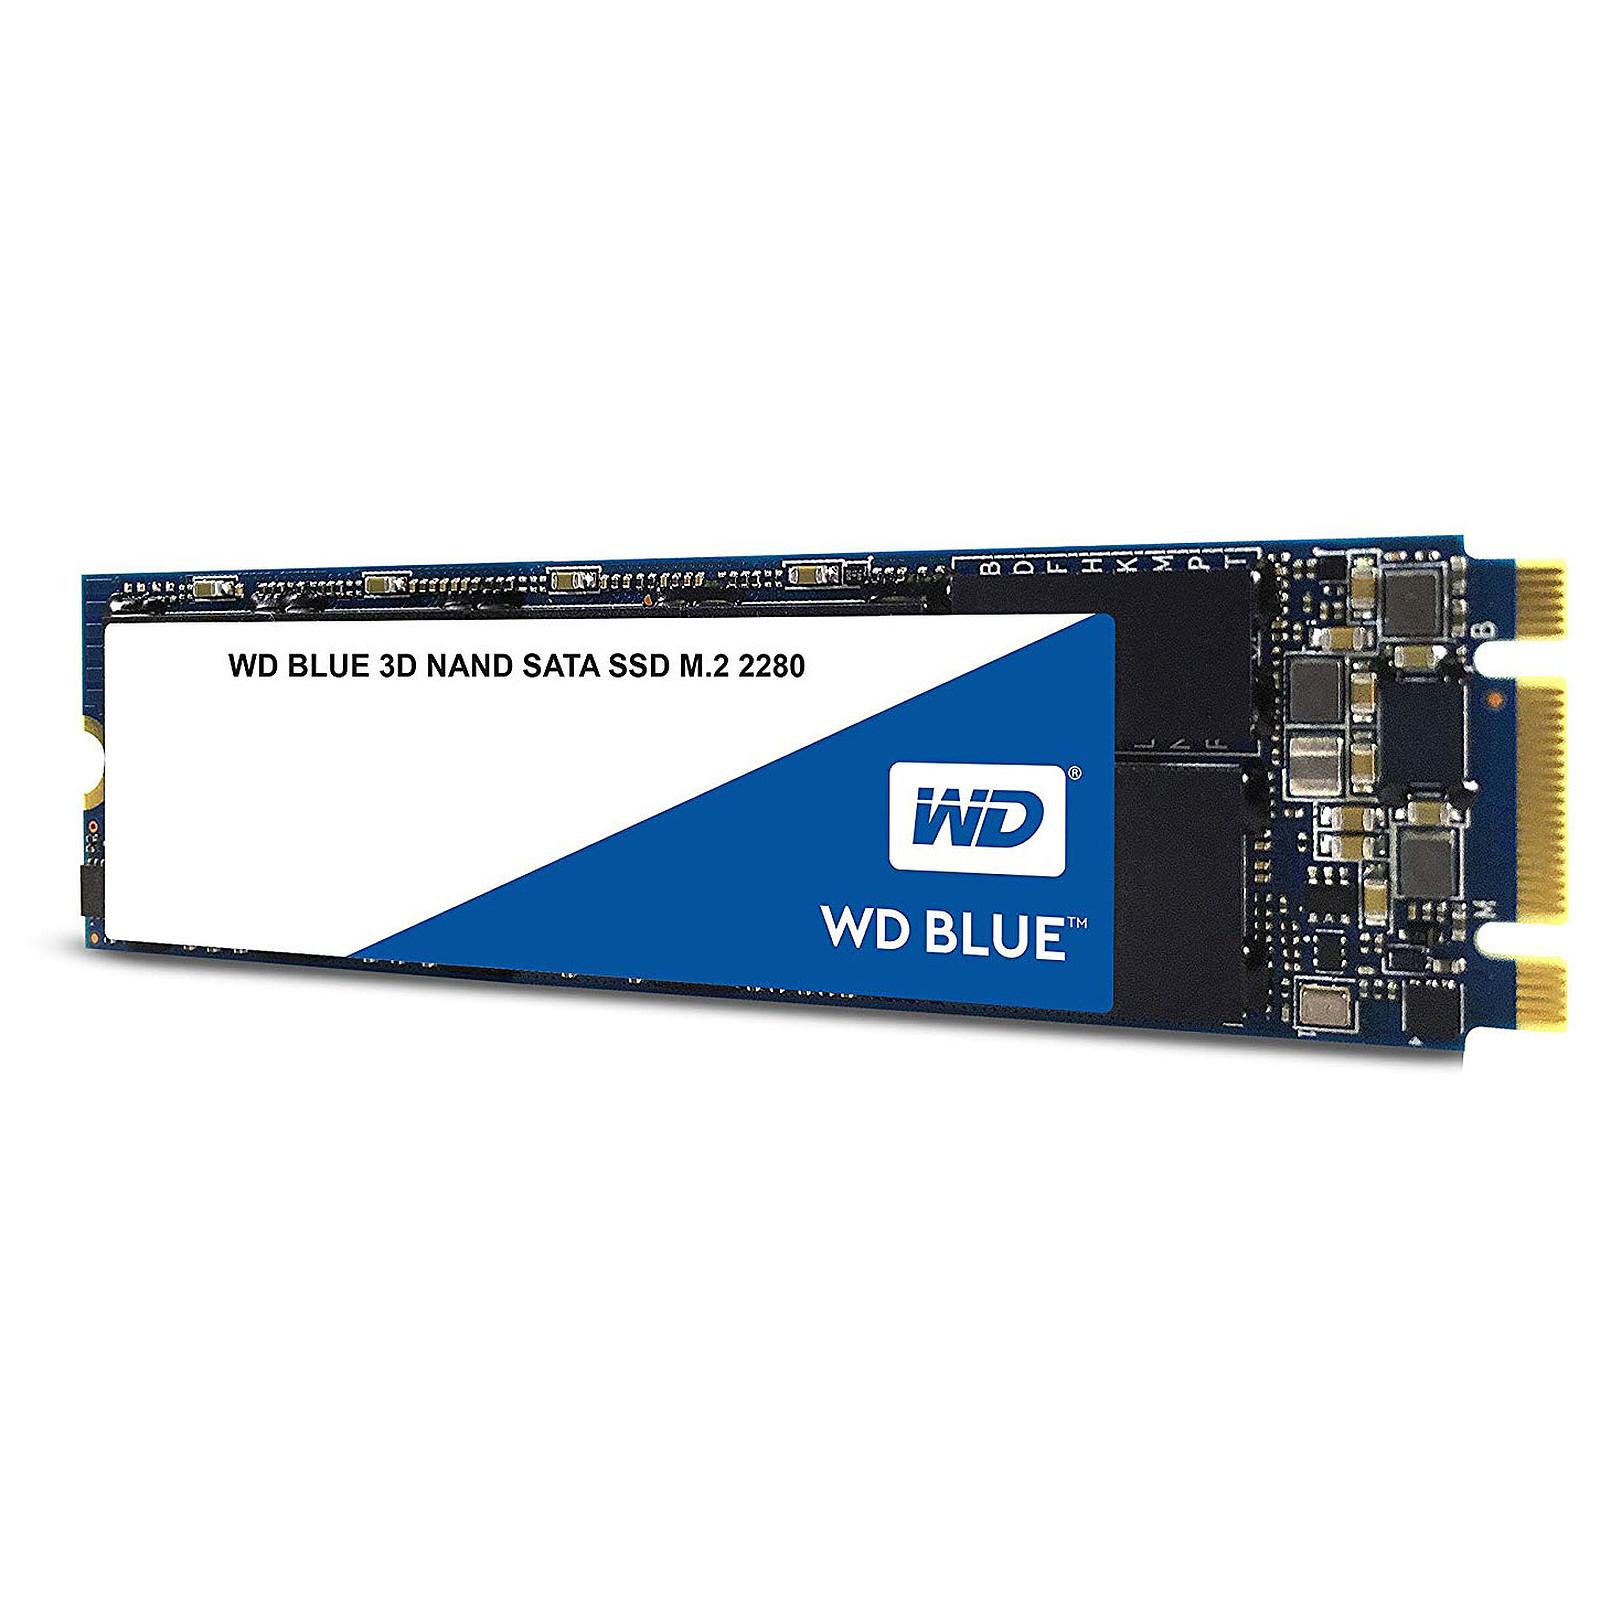 SSD interne M.2 Western Digital WD Blue 3D NAND SSD - 1 To